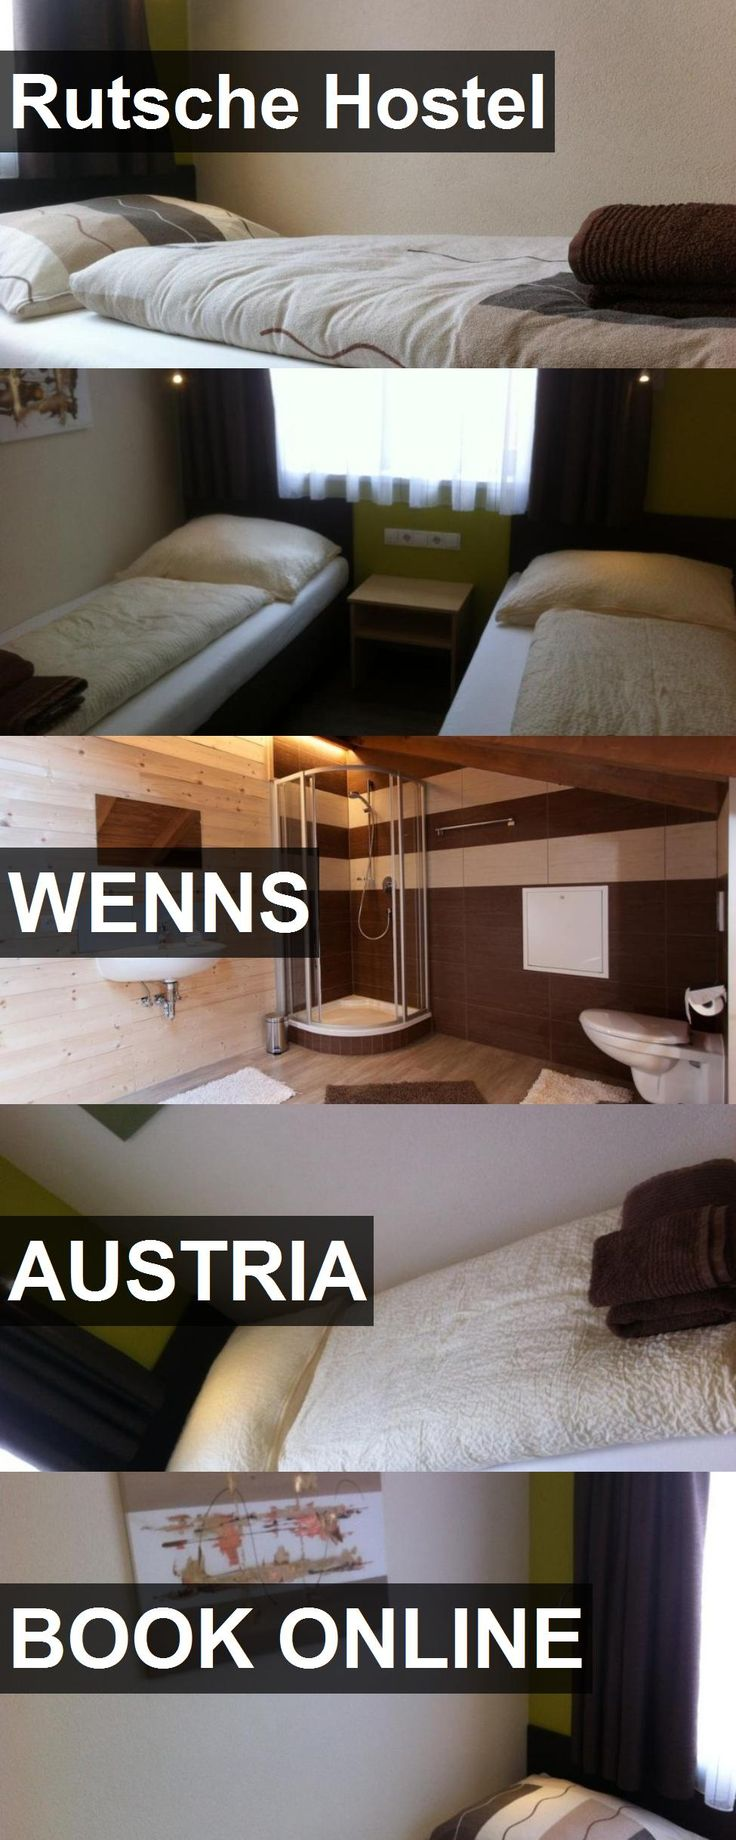 Hotel Rutsche Hostel in Wenns, Austria. For more information, photos, reviews and best prices please follow the link. #Austria #Wenns #RutscheHostel #hotel #travel #vacation